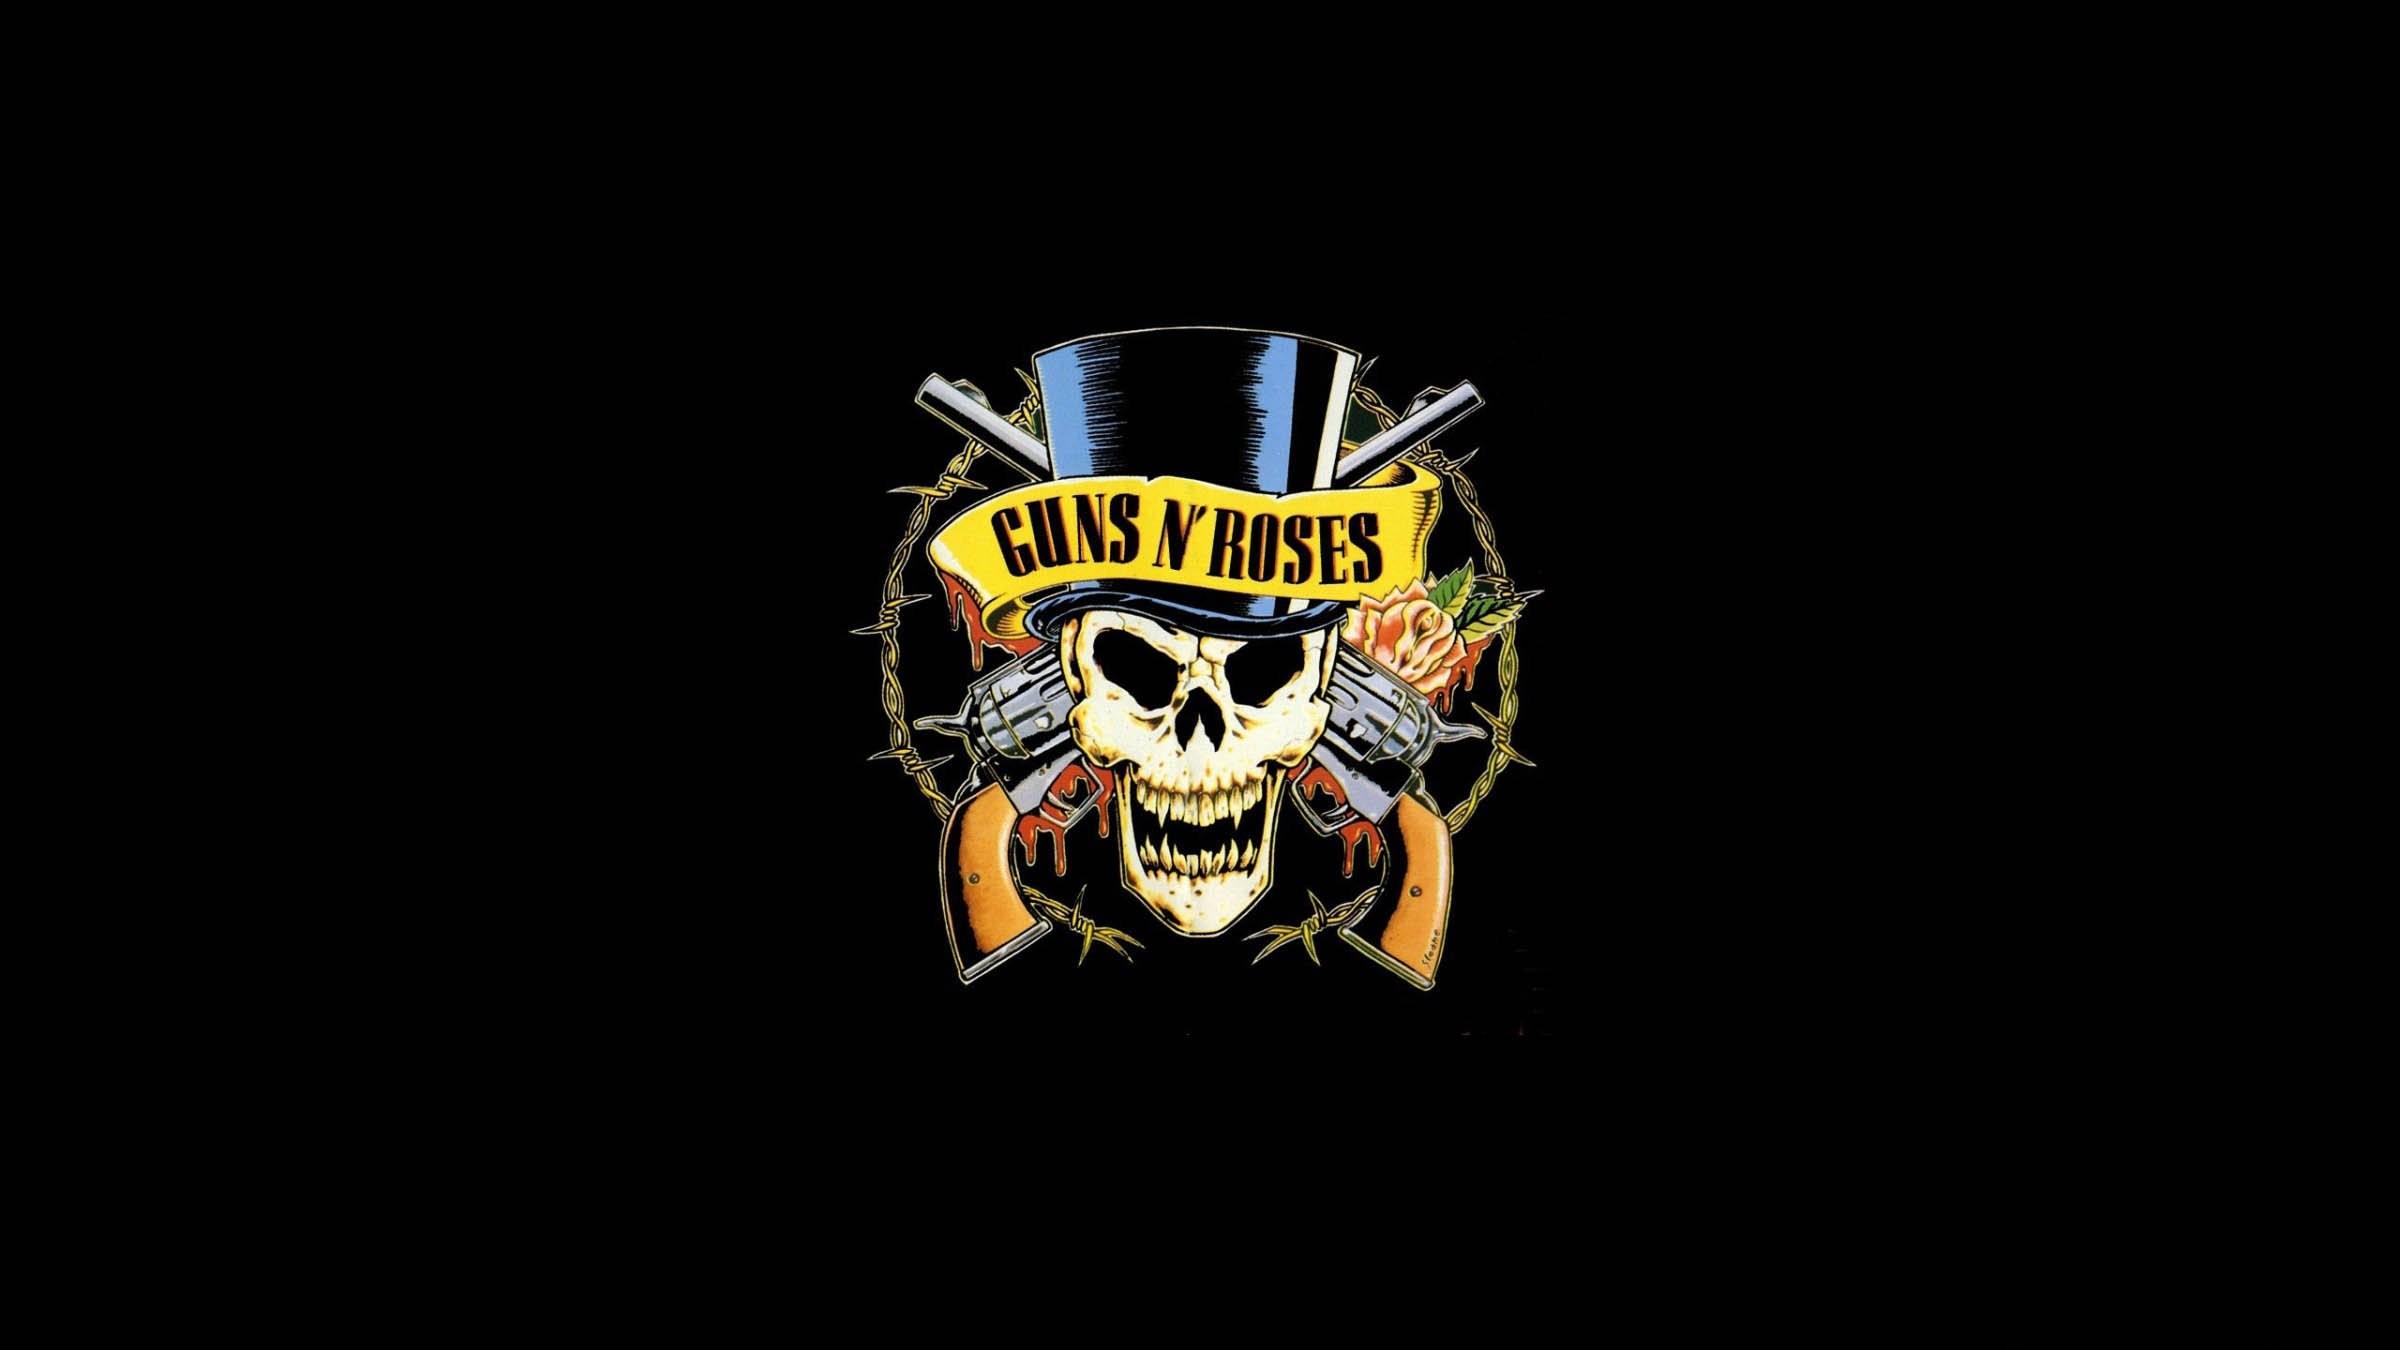 GUNS N ROSES heavy metal hair hard rock poster dark skull weapon gun  wallpaper | | 326098 | WallpaperUP